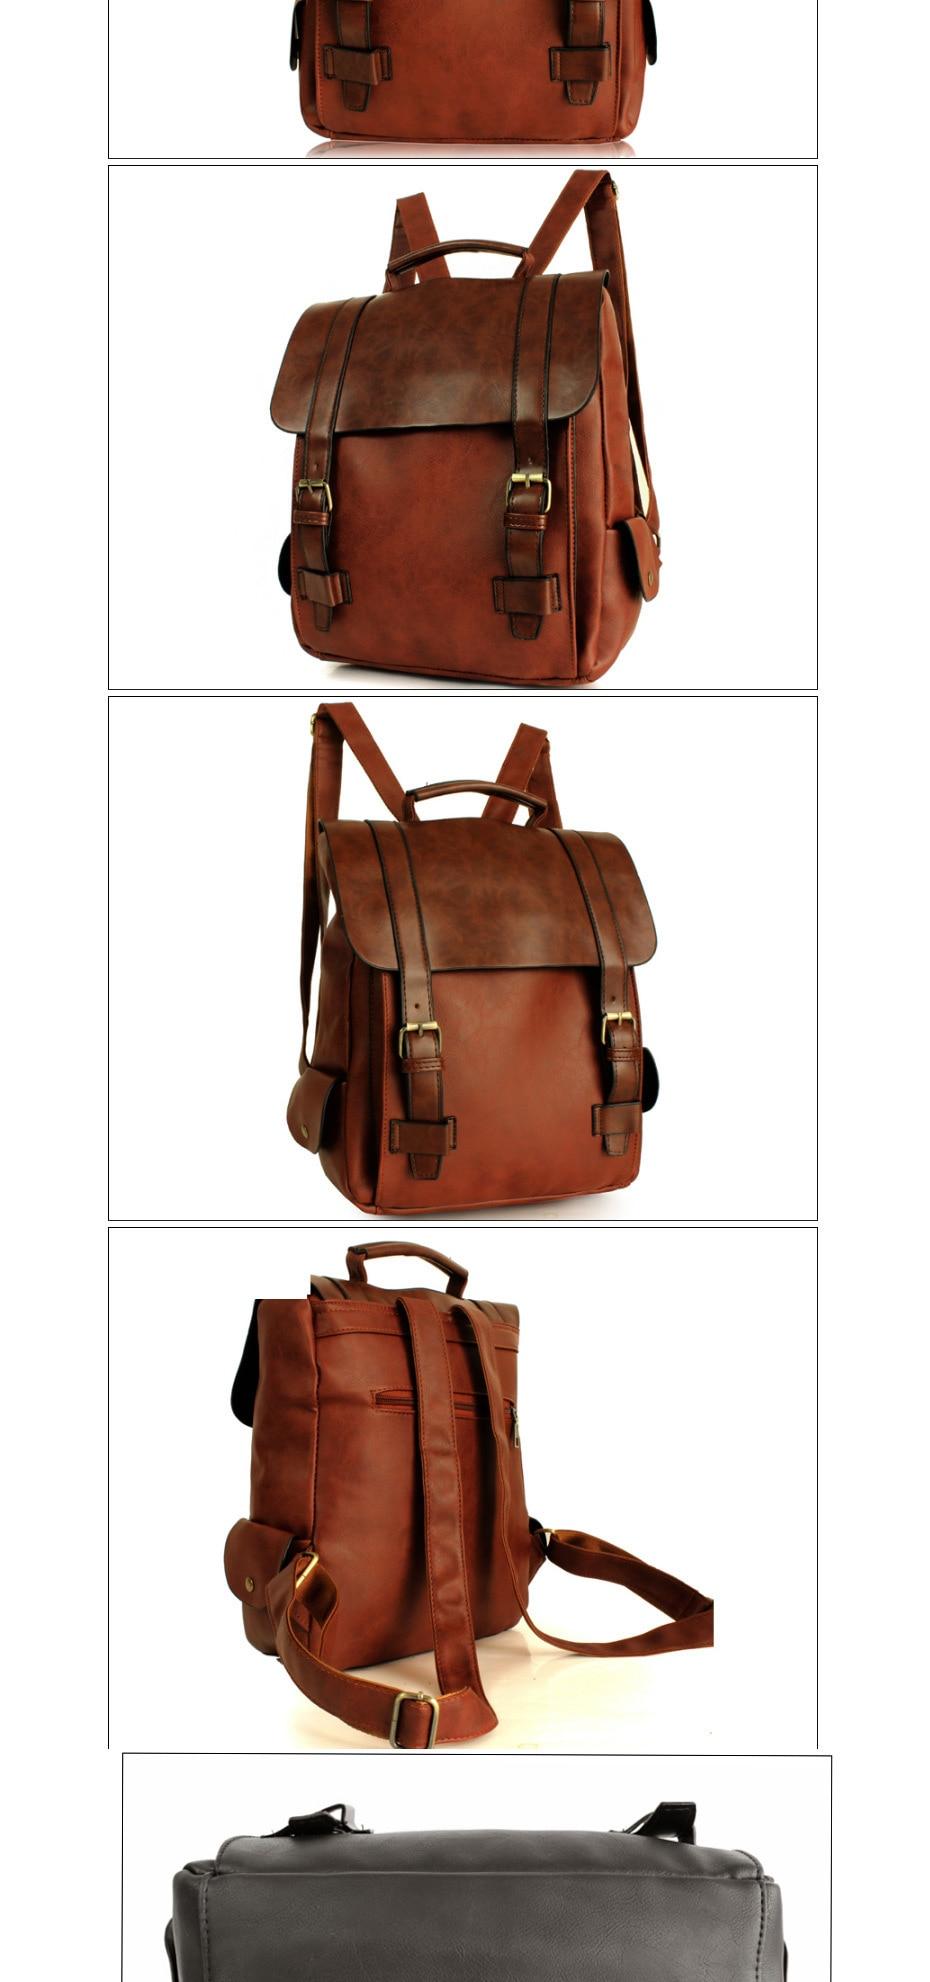 HTB1vTsWgTtYBeNjy1Xdq6xXyVXa1 - 2018 Fashion Women Leather School Vintage Backpack Men Small Schoolbag Mochila Feminina Brown Black Backpacks Kanken Sac A Dos